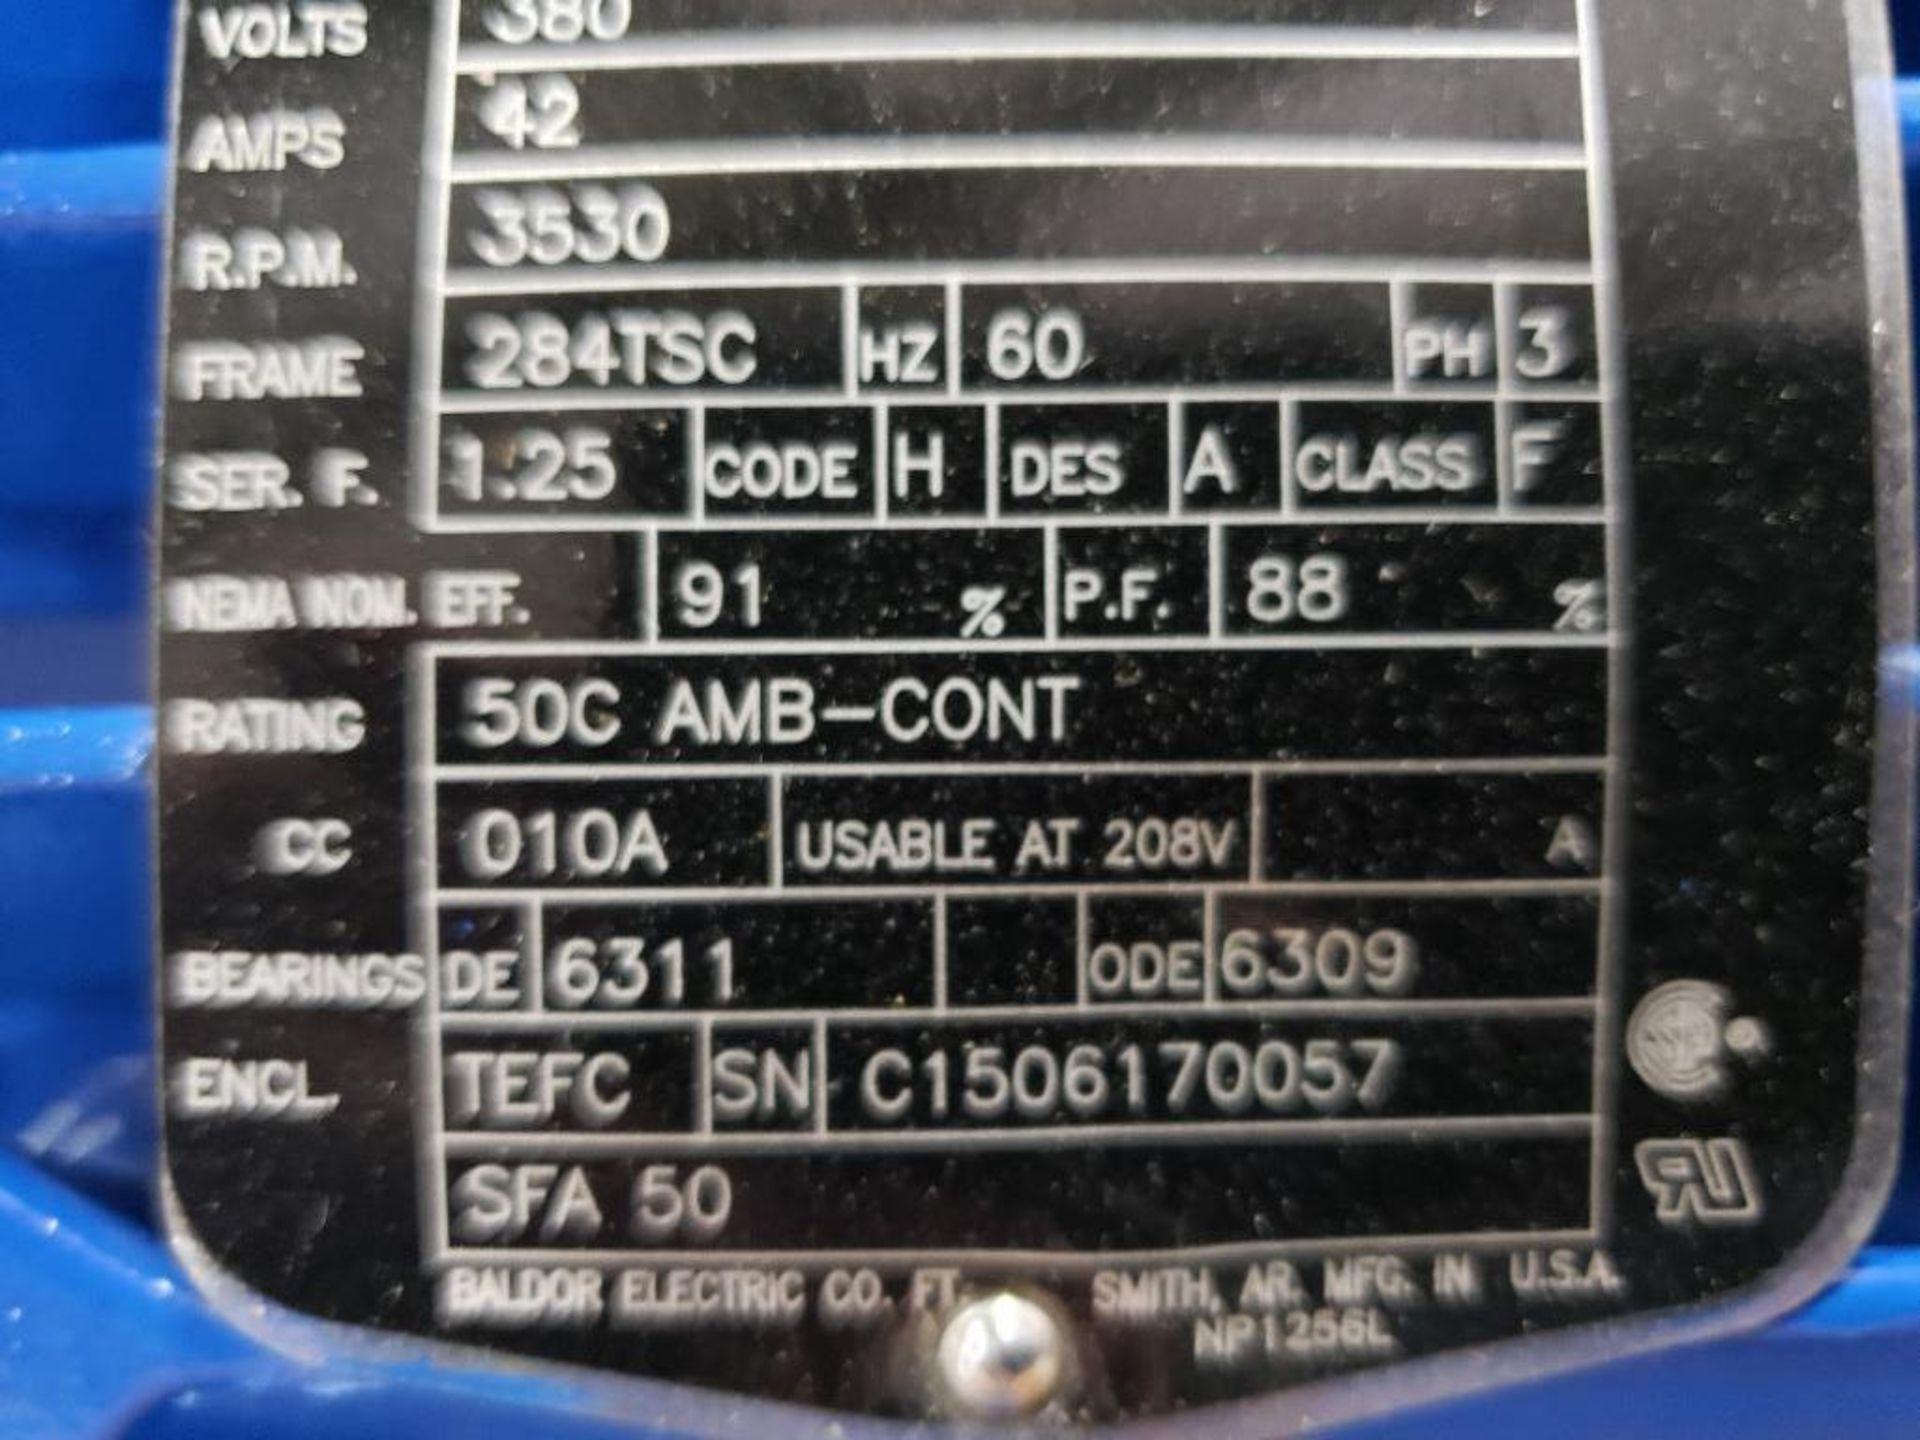 30HP Baldor Reliance 3PH motor. 2013006282. 380V, 3530RPM, 284TSC-Frame. - Image 5 of 8